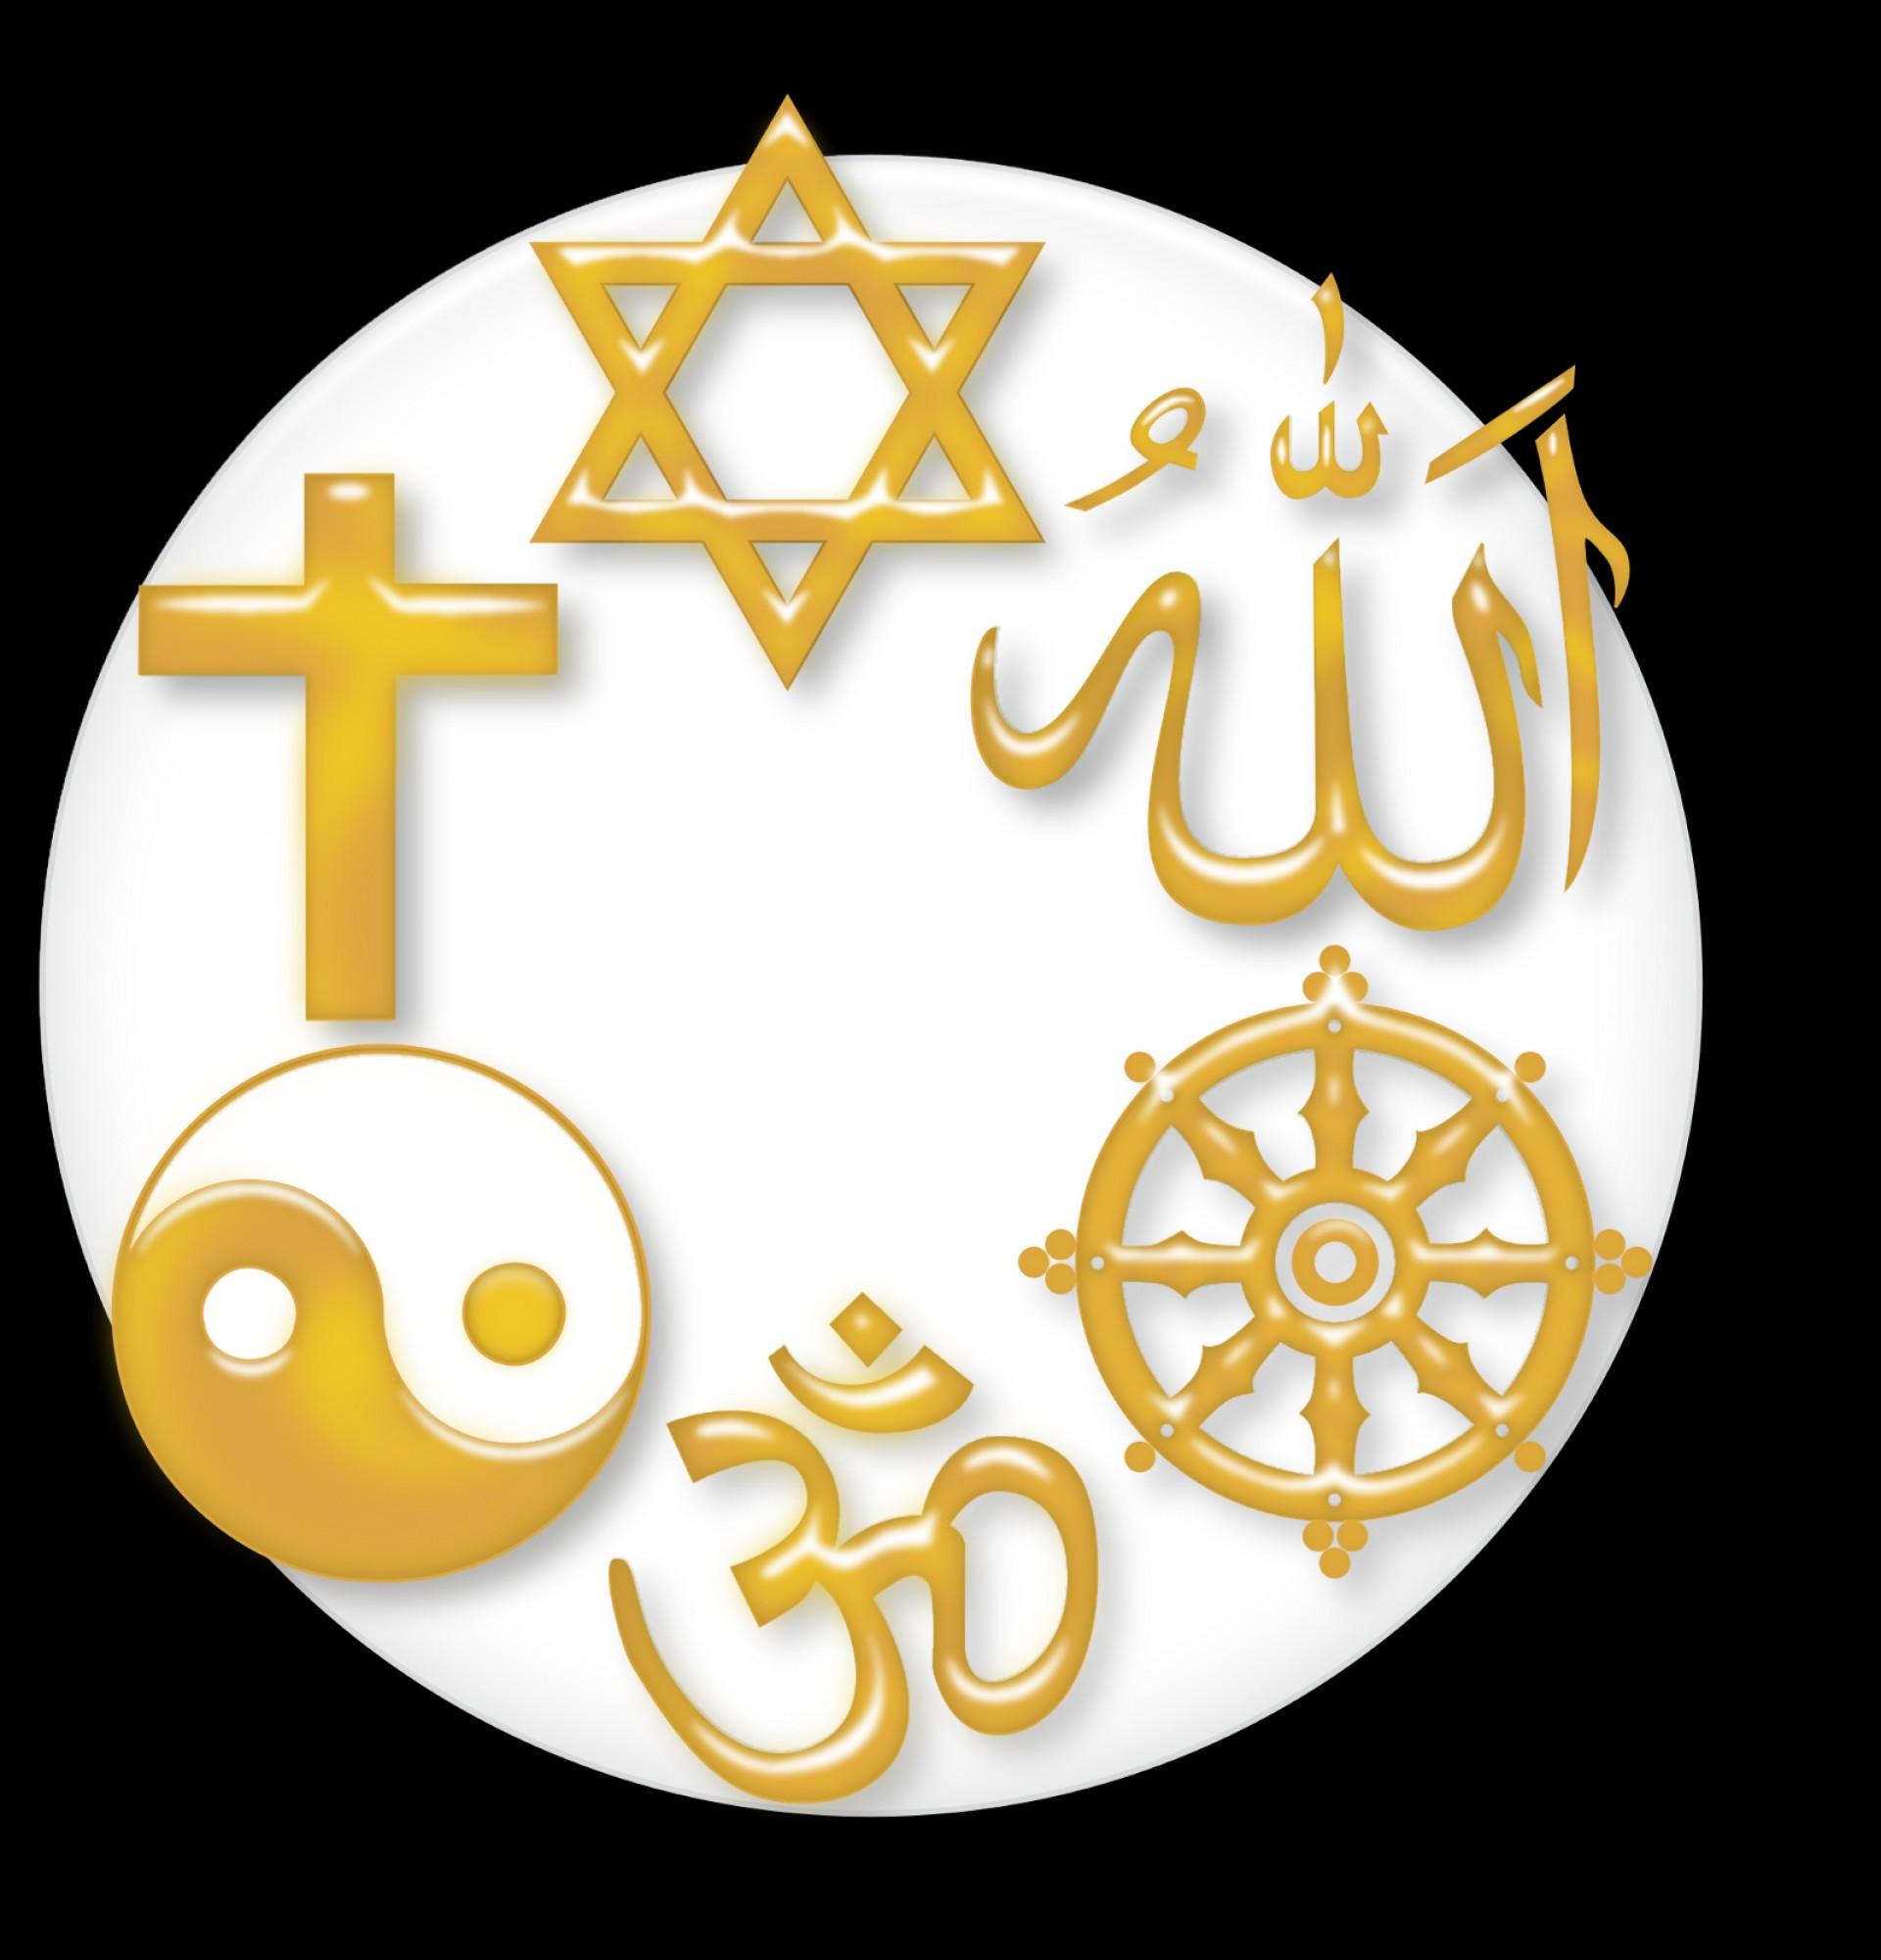 006 Cxkzl4phxwxmwztlh0fdq Essay Example Is There One True Unique Religion 1920